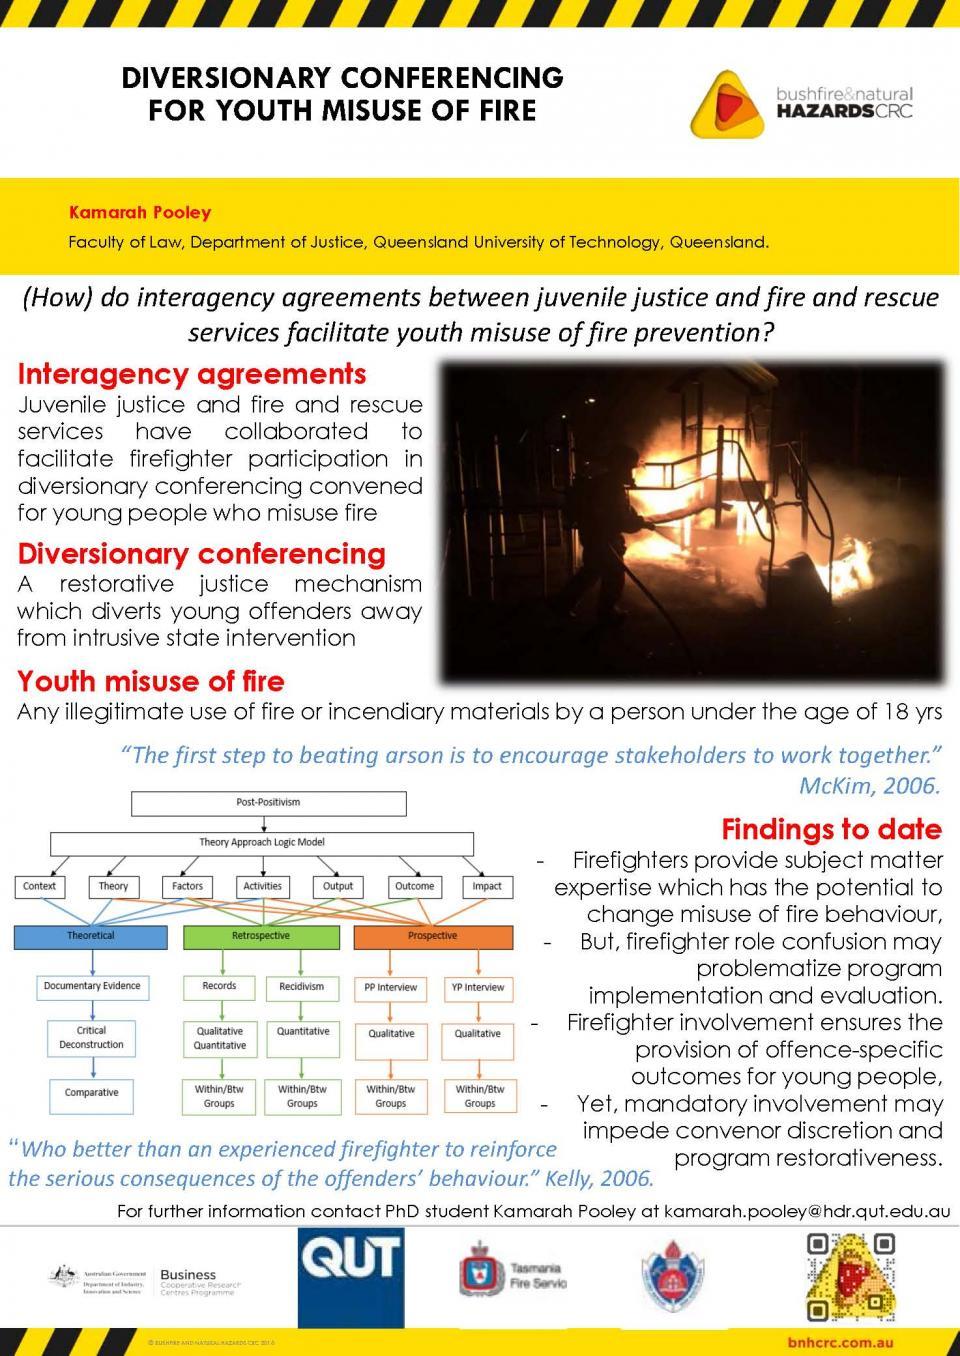 Kamarah Pooley Conference Poster 2016